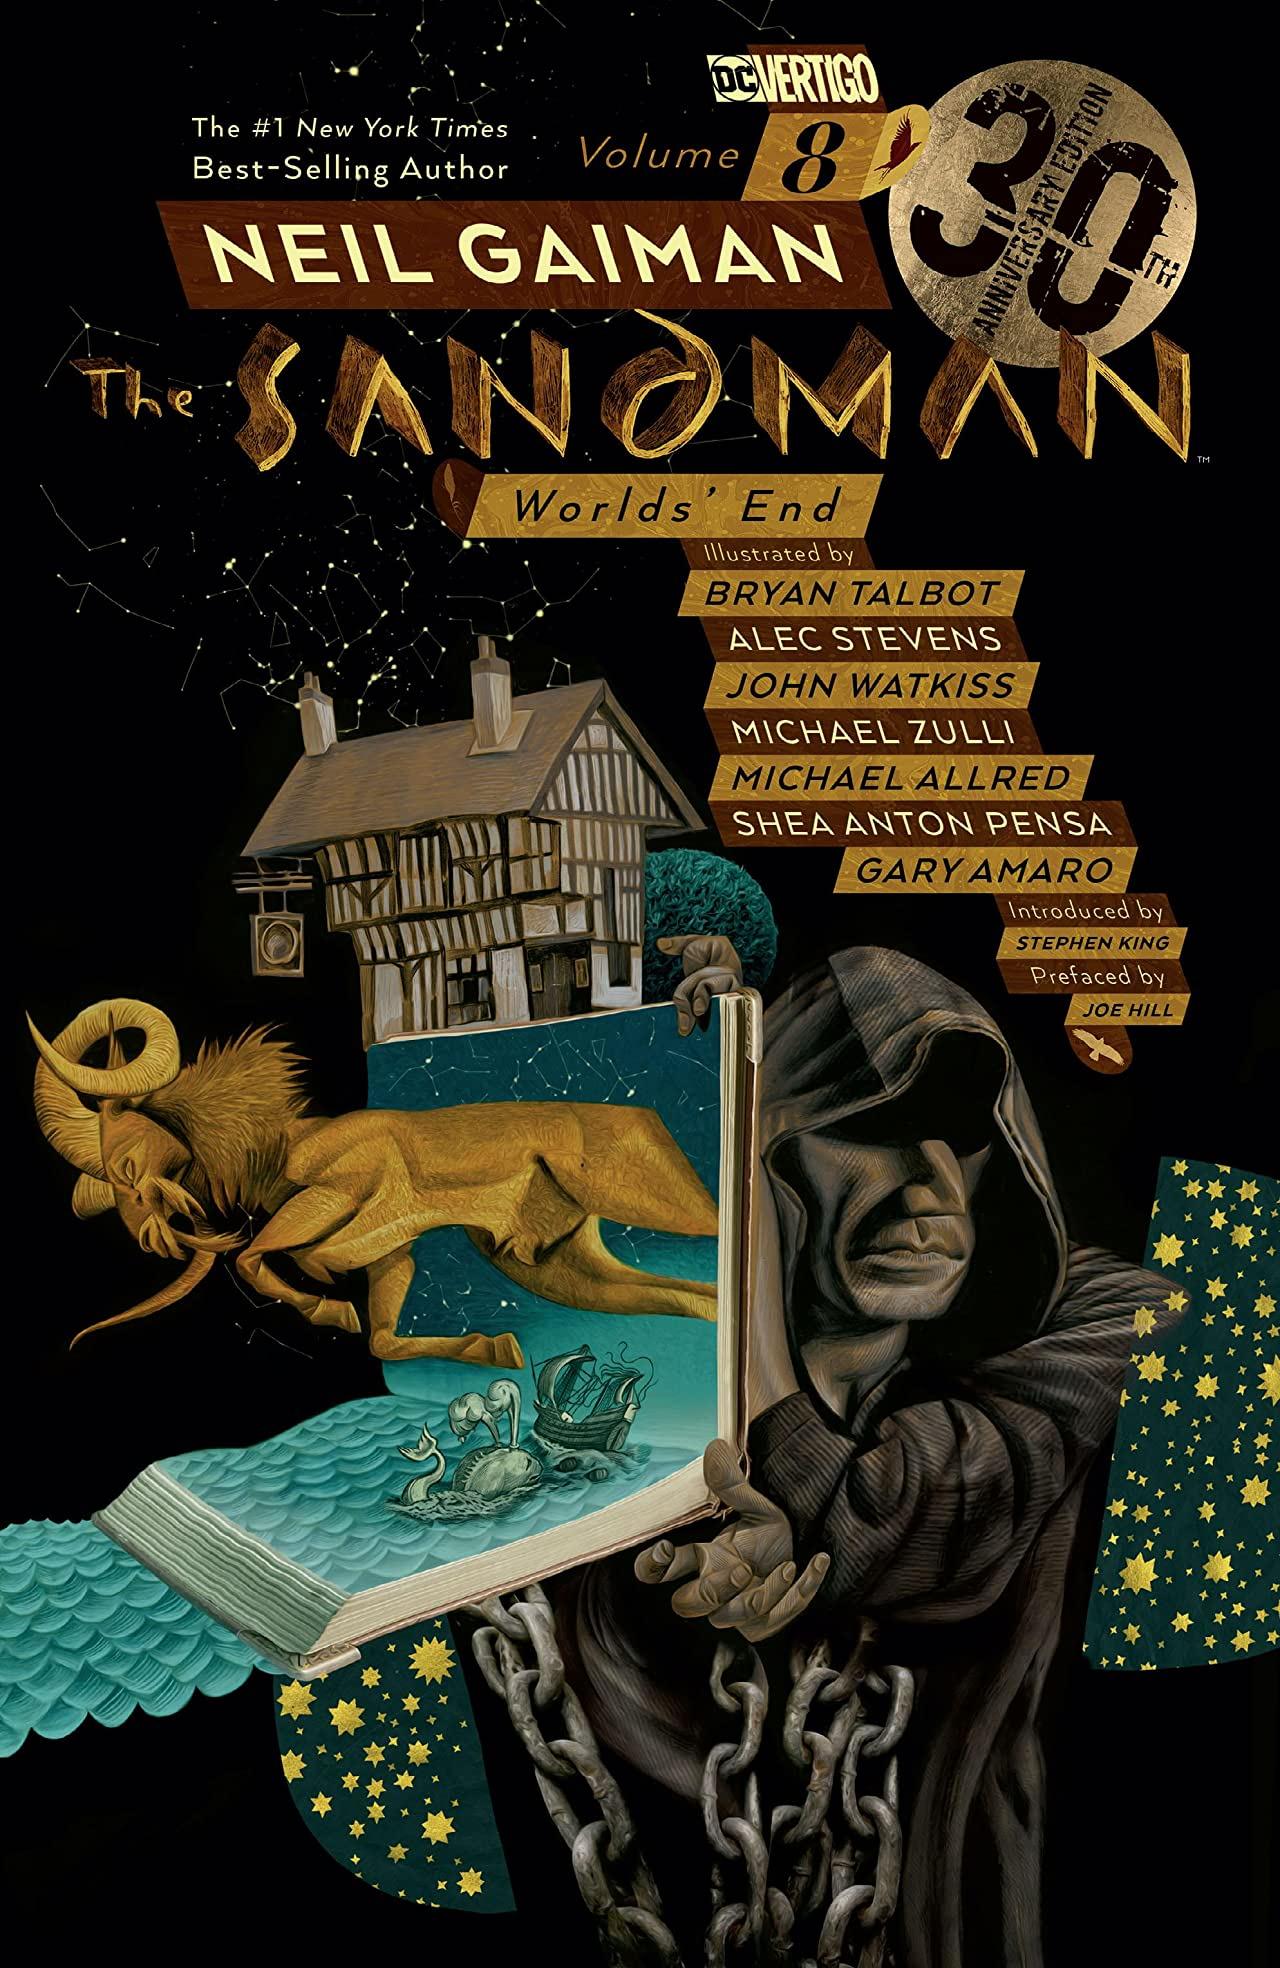 The Sandman, Vol. 8: Worlds' End - 30th Anniversary Edition by Neil Gaiman